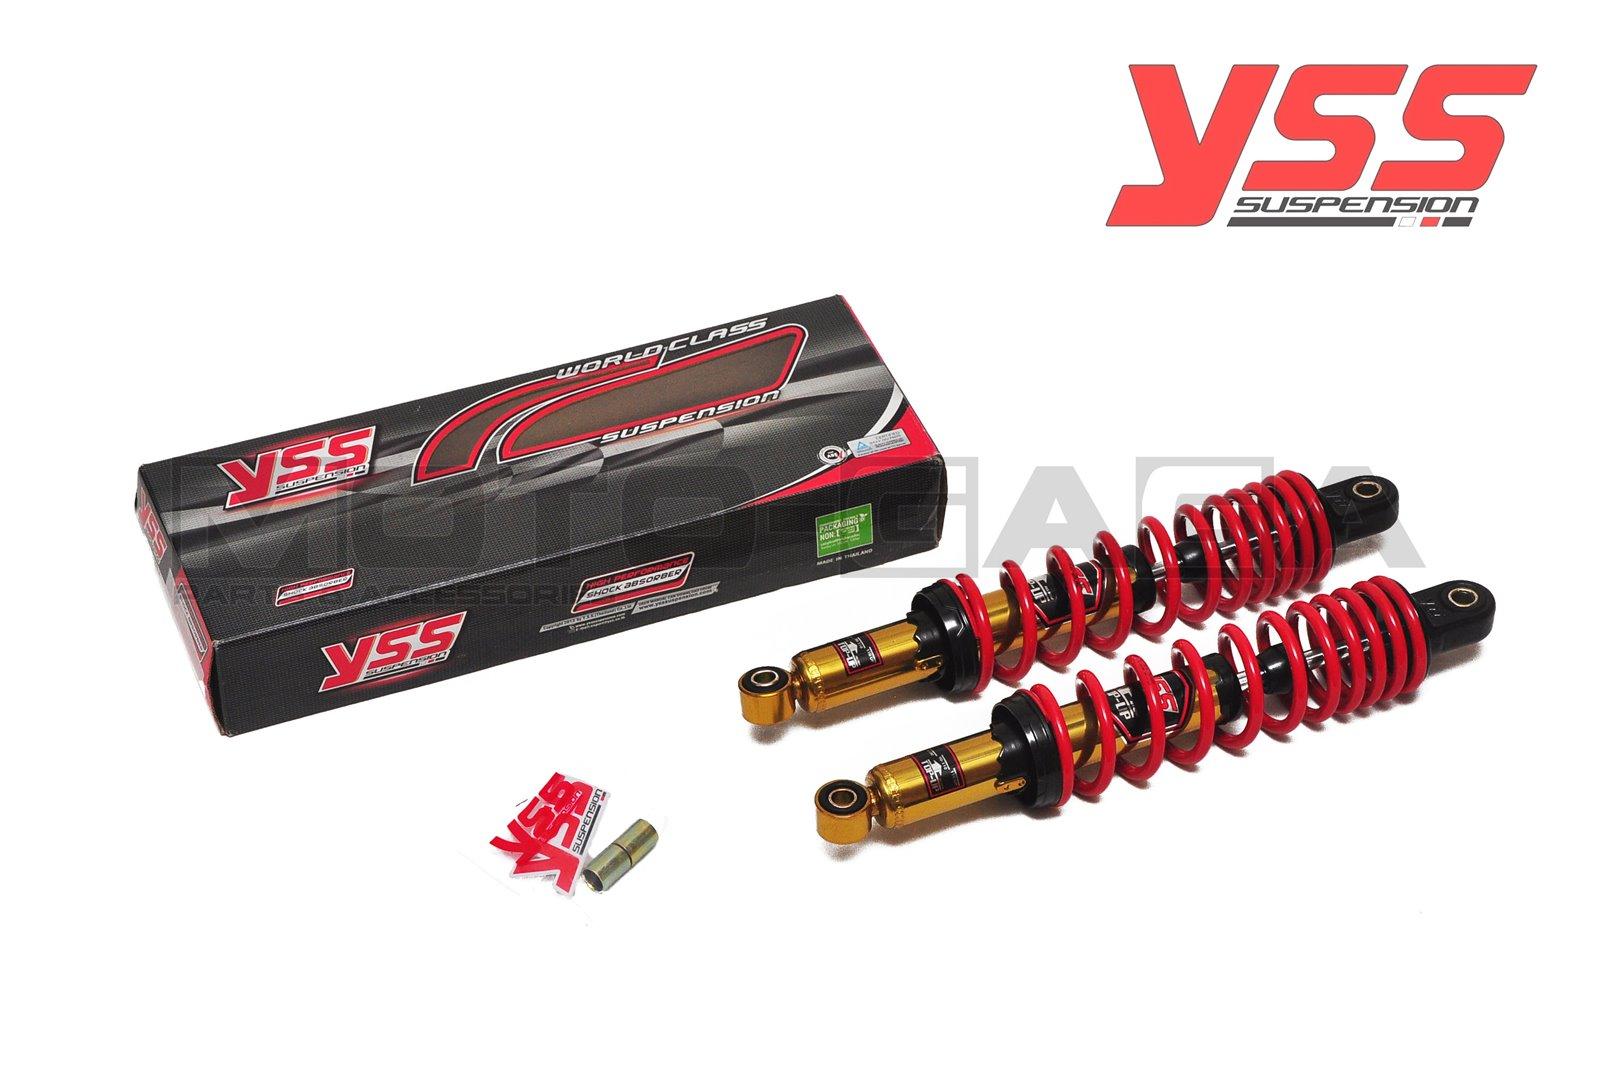 YSS TOP UP Dual Shock Absorbers (280mm) - Universal/Honda/Yamaha